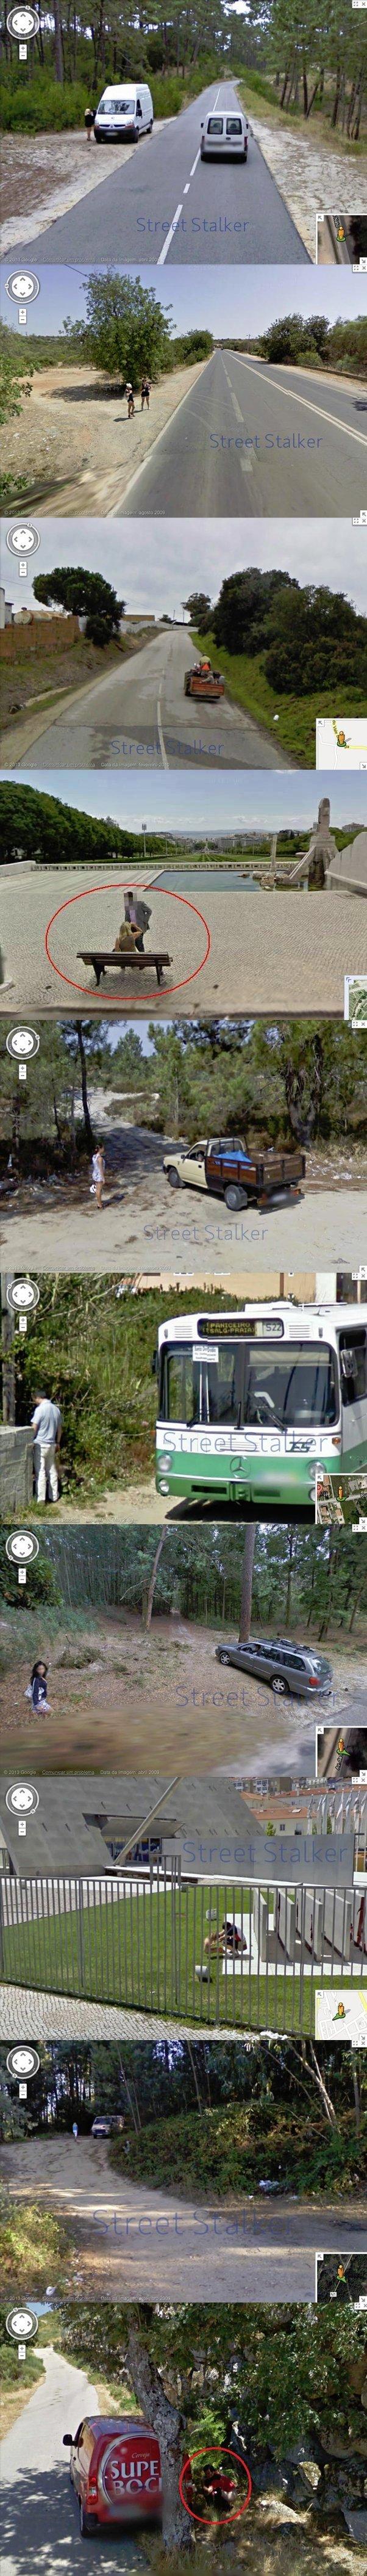 Portugal on Google Street. . p. all